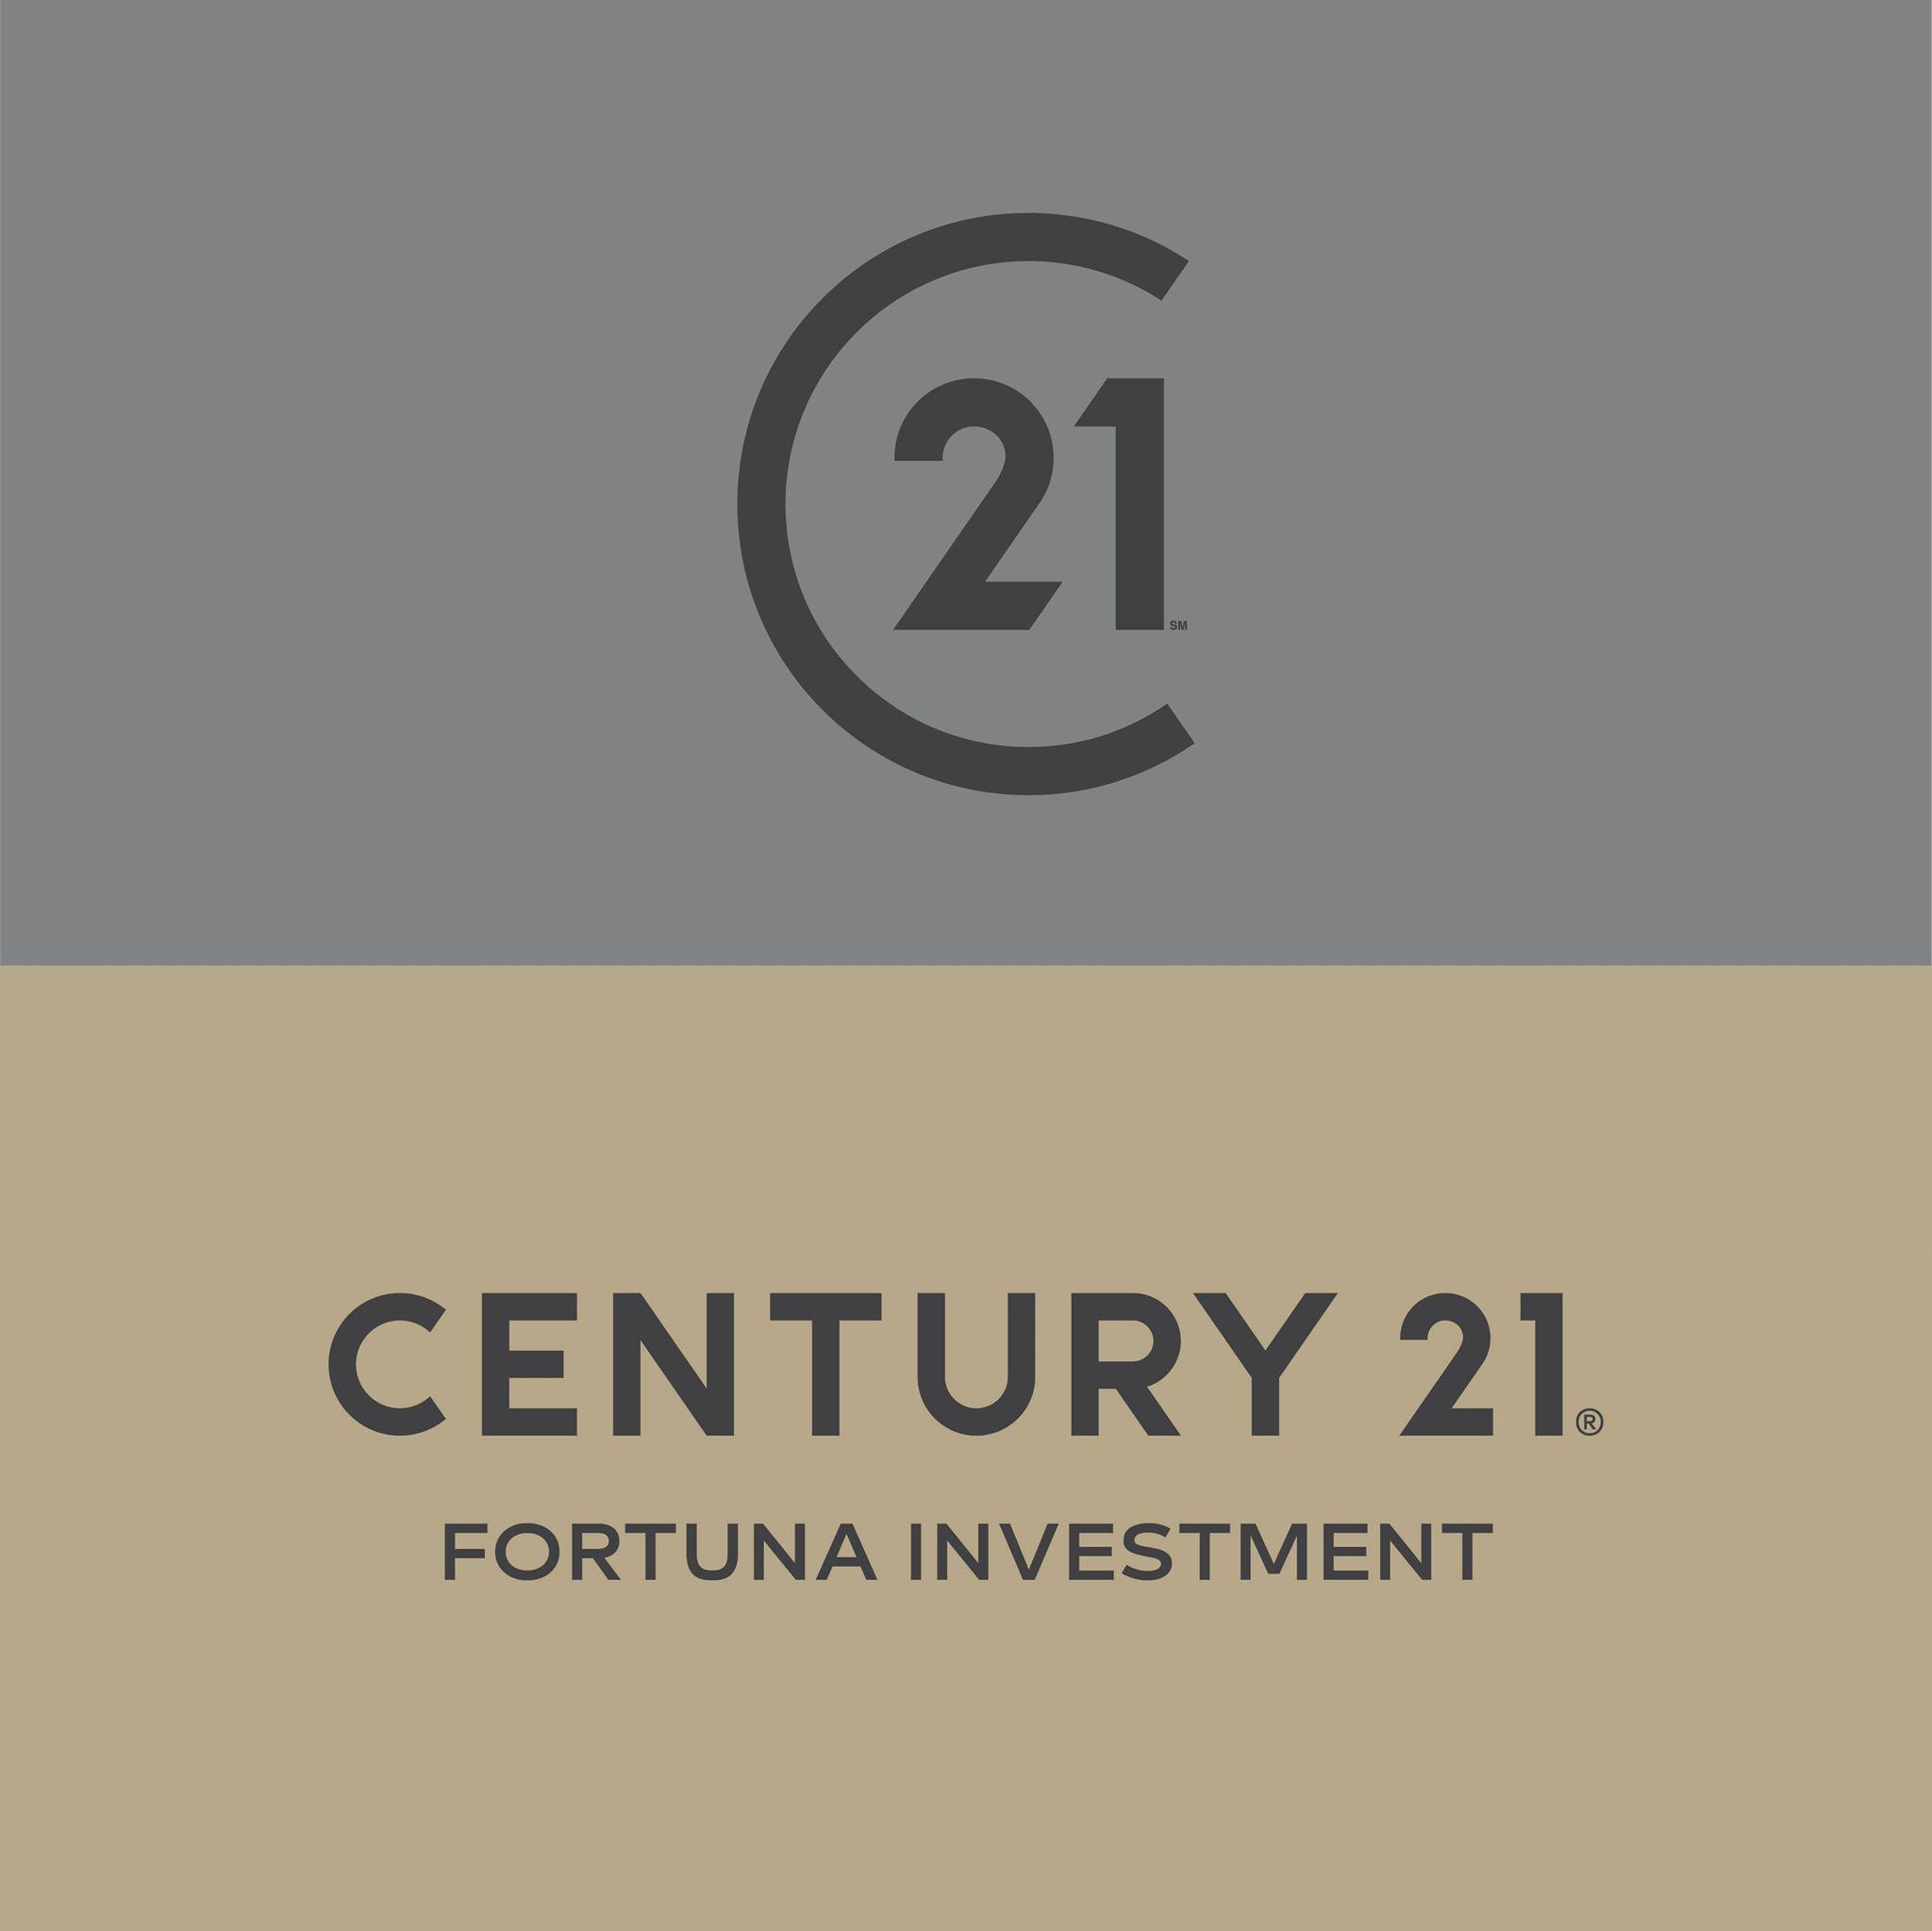 Century 21 Fortuna Investment